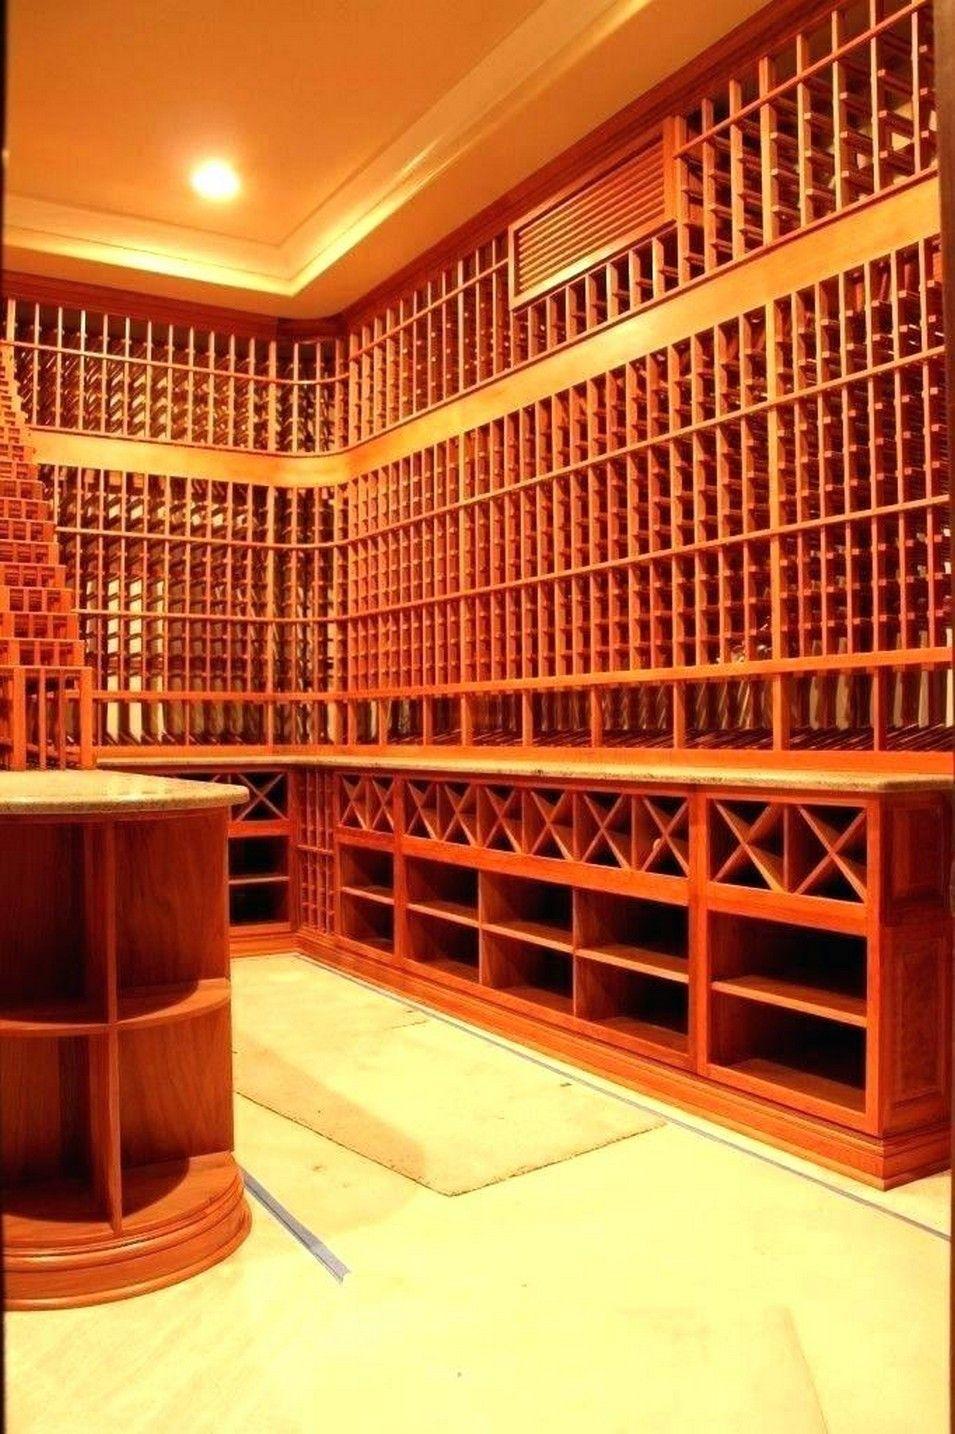 Magnificent Arrangement Concept Of Cellar Must See Cellar Decor Ideas Wine Cellar Design Cellar Design Custom Wine Cellars